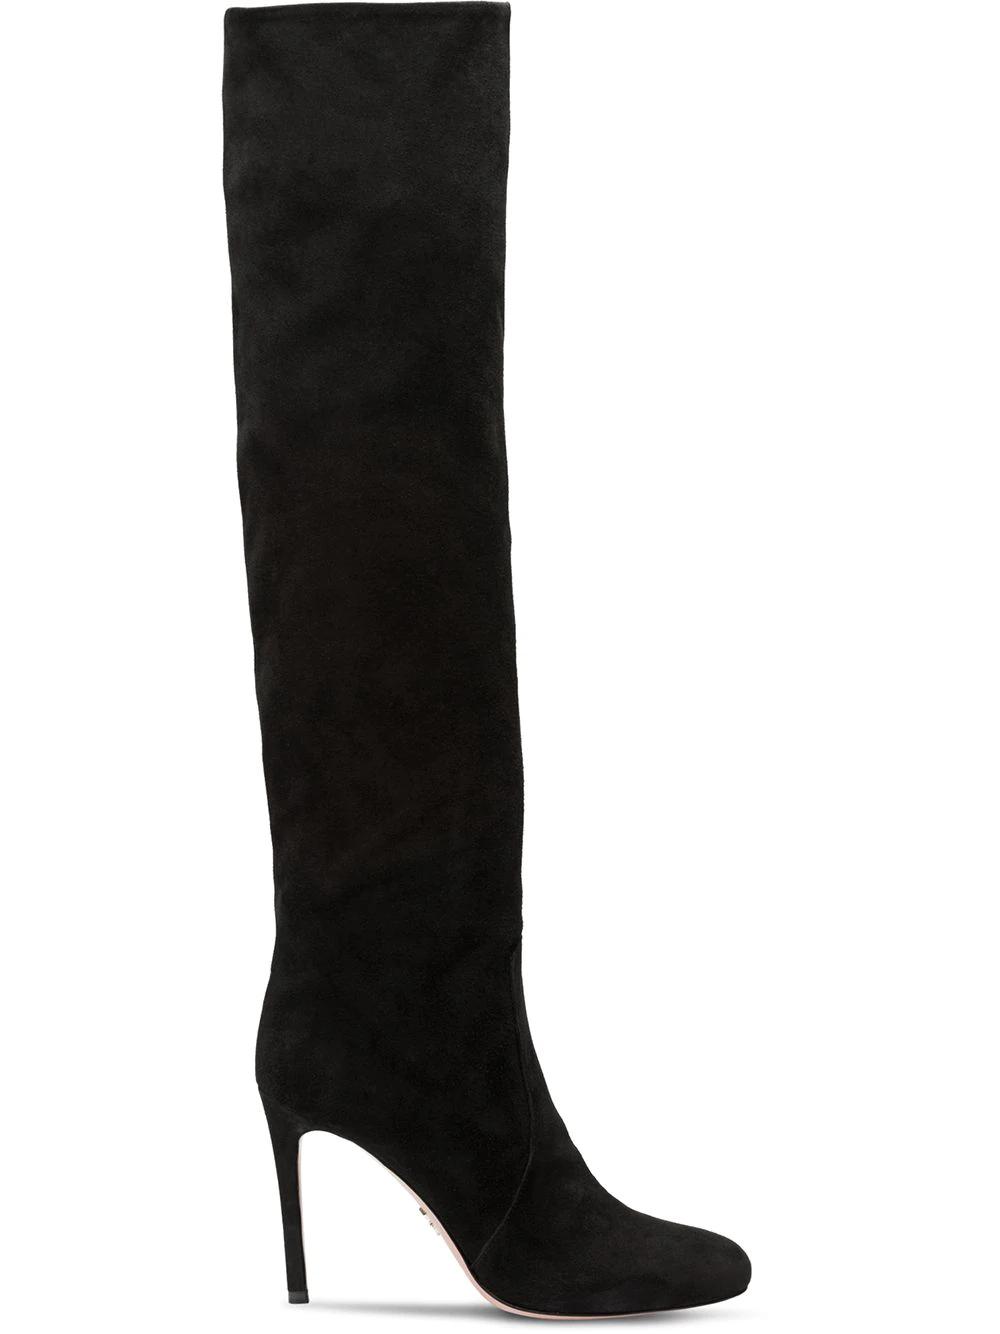 a7eb16e64ff Prada Suede Over-The-Knee Boot In Black